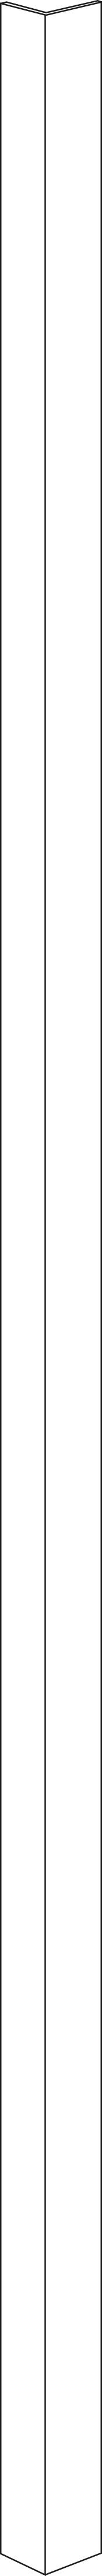 SIDOLIST S8/S62/63 185 CM H/V. VIT